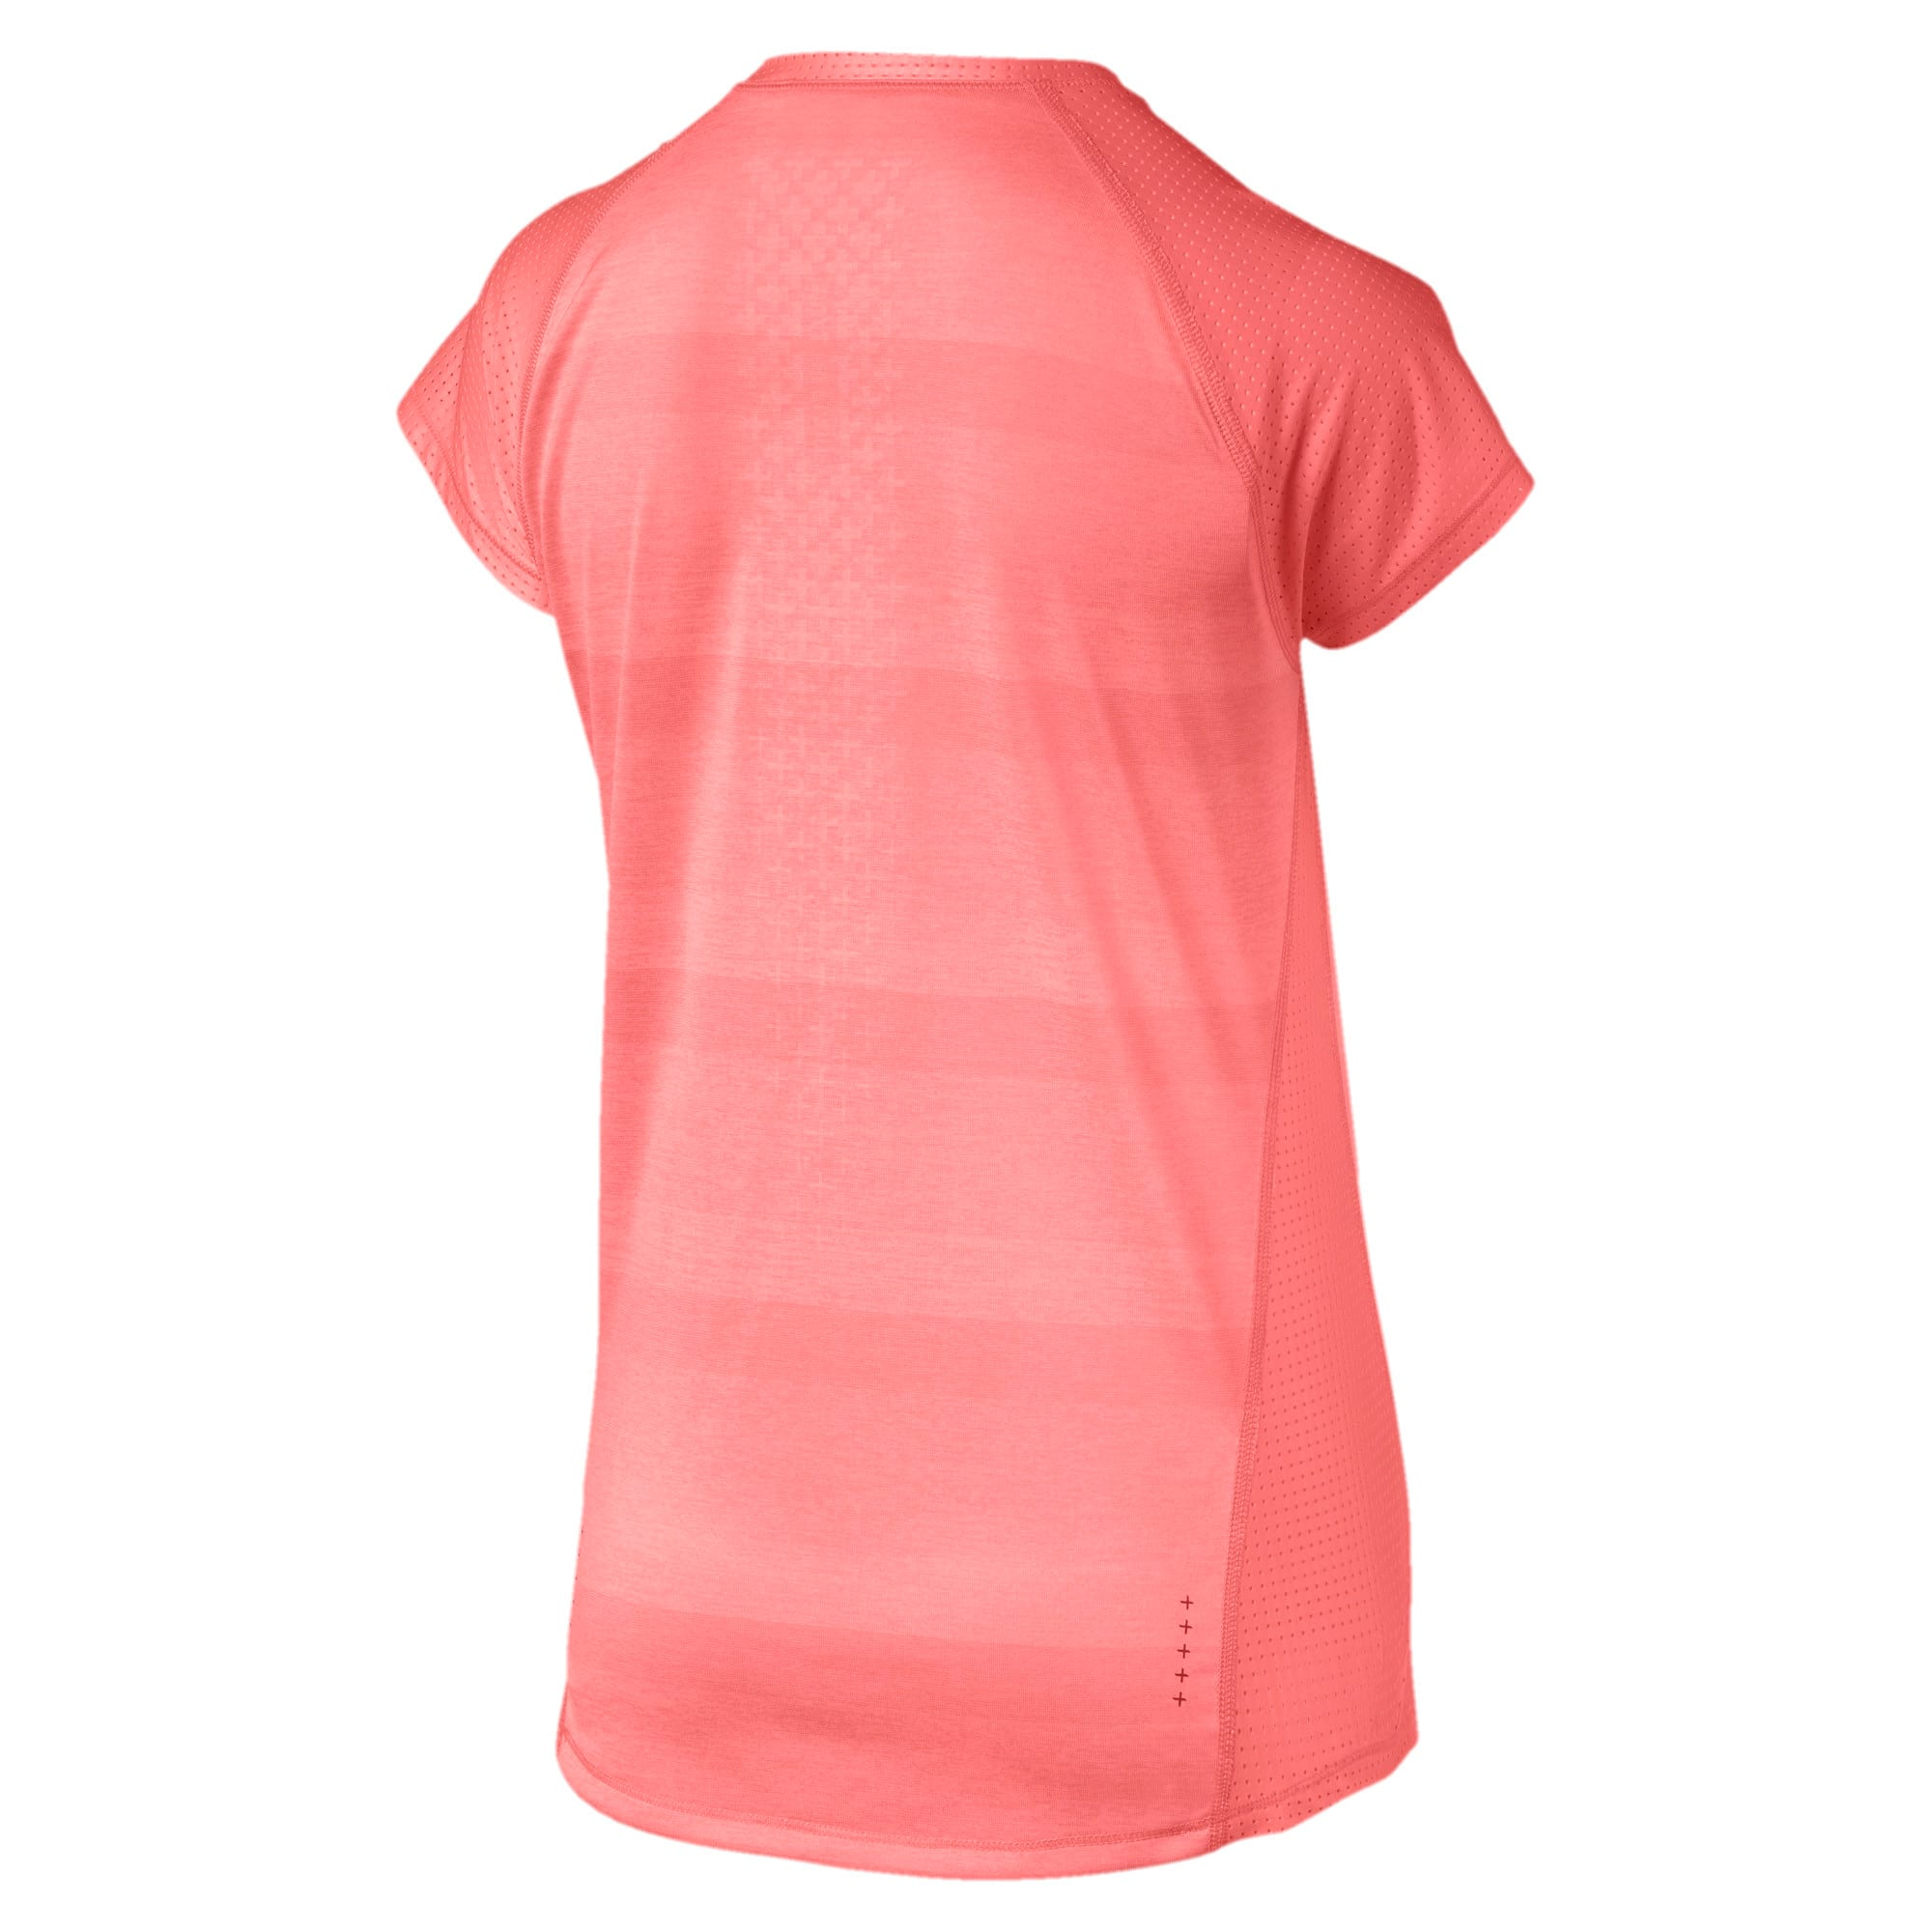 Thumbnail 5 of Thermo-R+ Short Sleeve Women's Running Tee, Bright Peach Heather, medium-IND